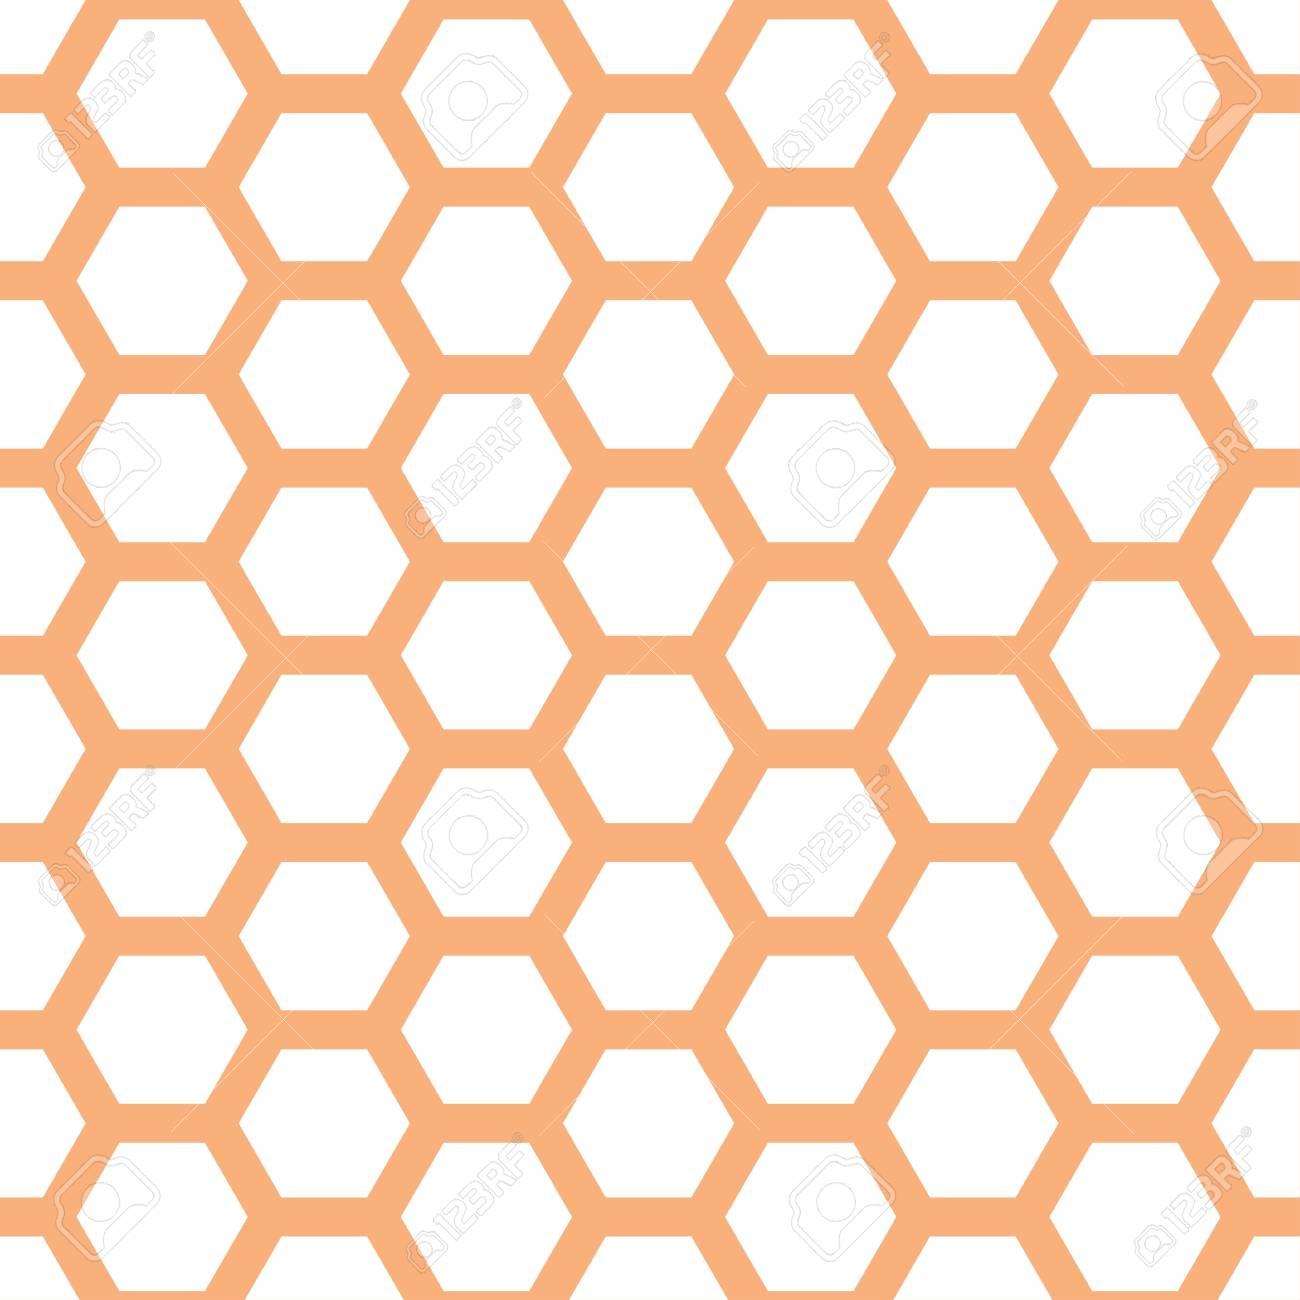 Seamless geometric pattern with honeycombs - 114708567